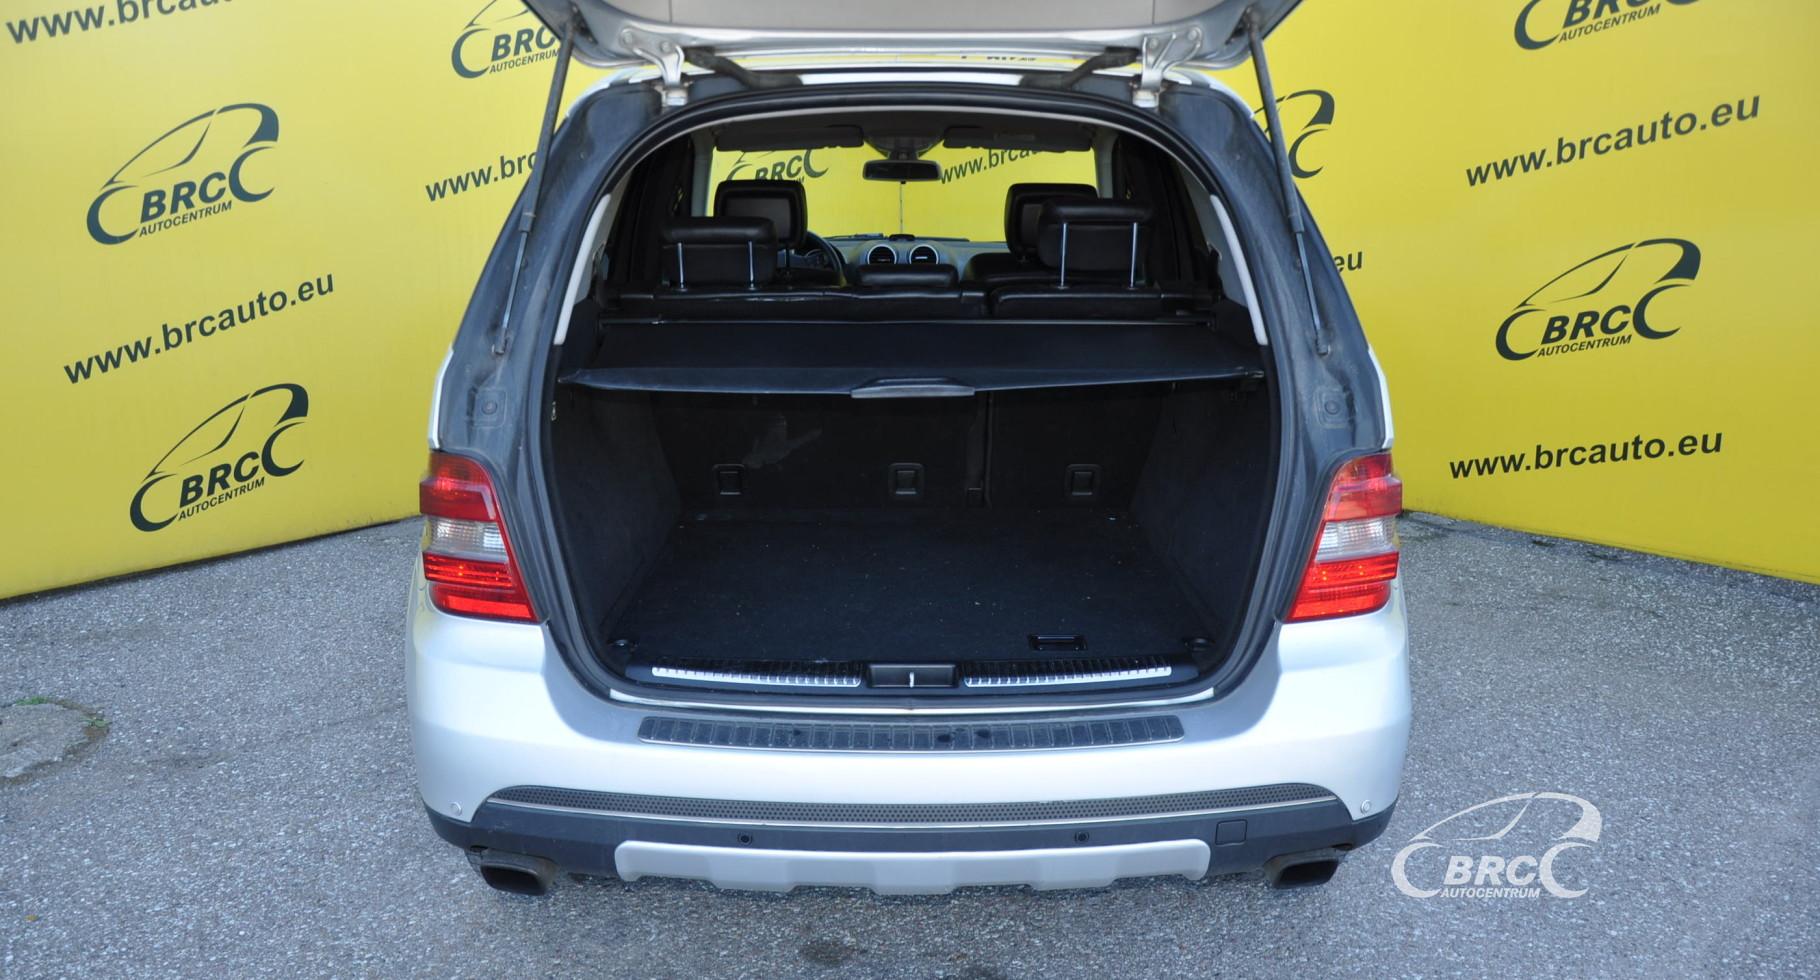 Mercedes-Benz ML 320 CDI 4Matic